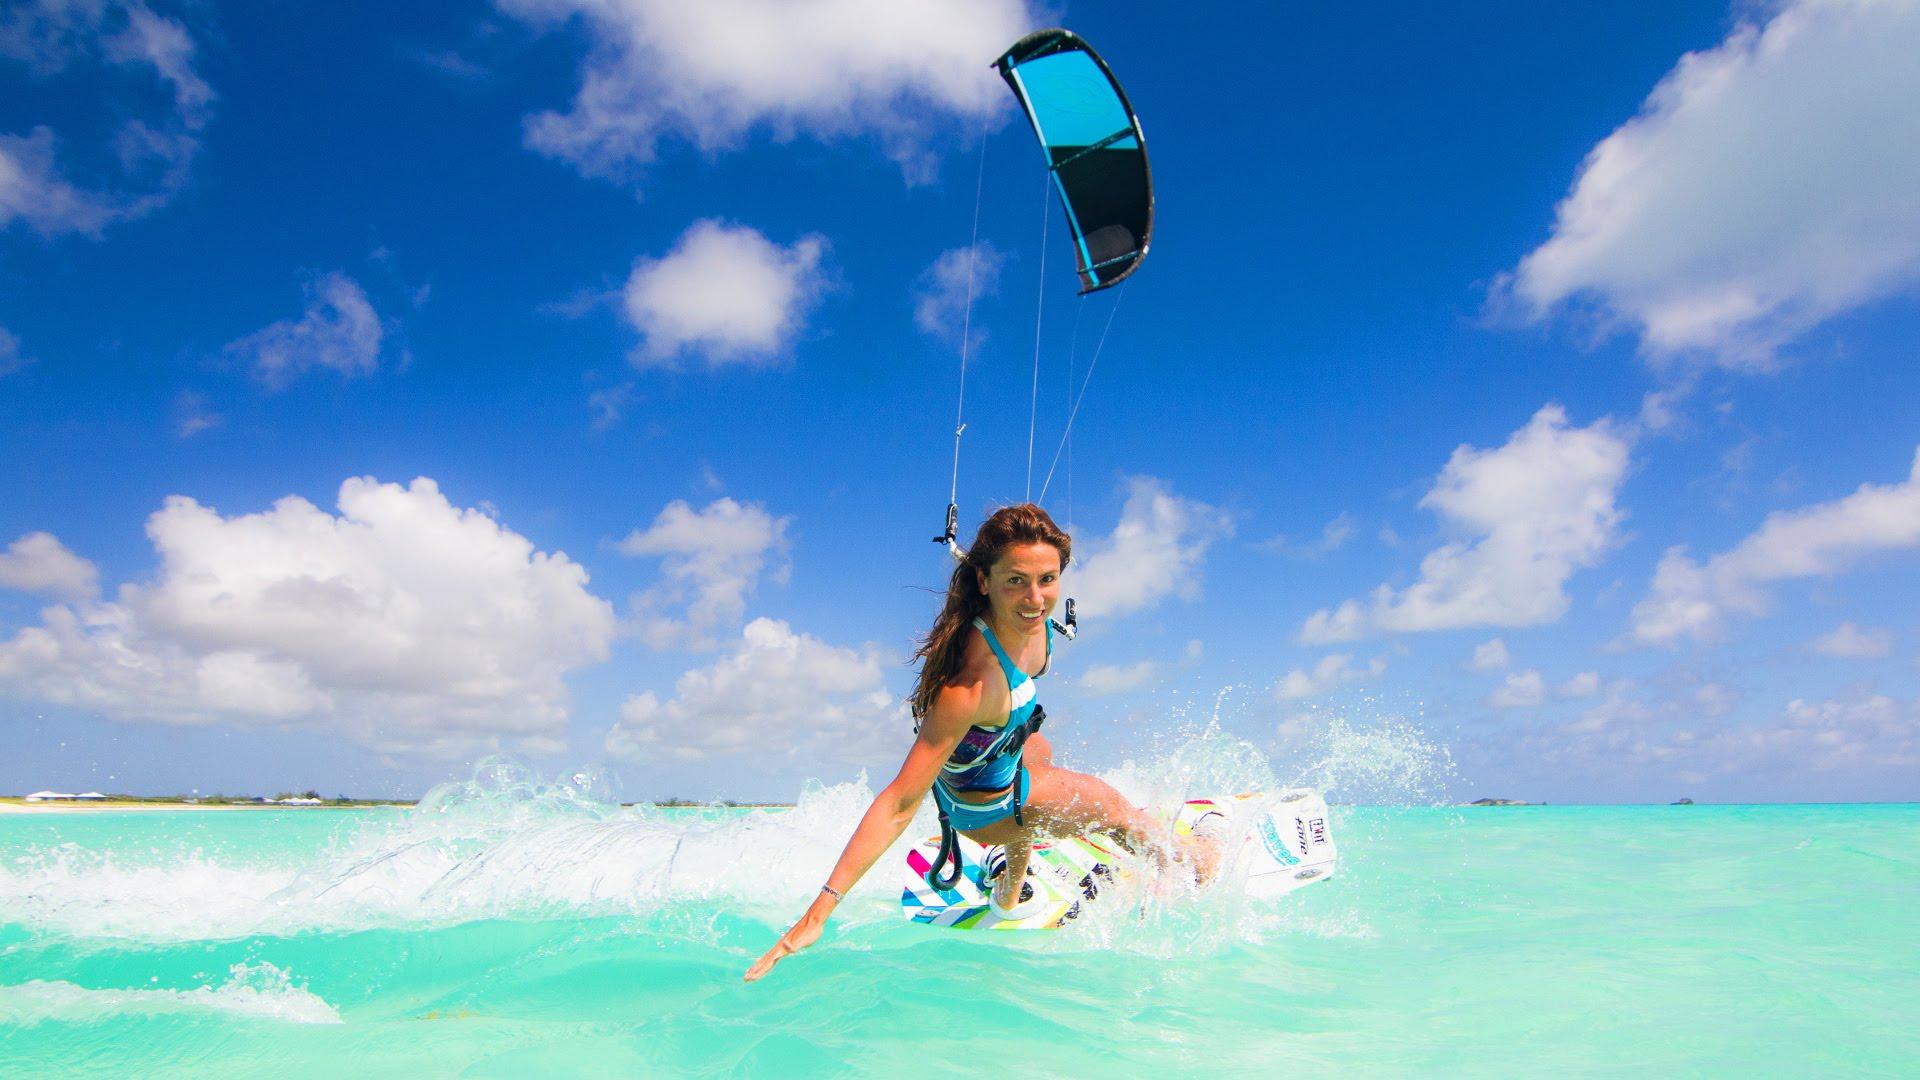 The Best Kitesurfing Spots in the World 4K - Part 1 - YouTube